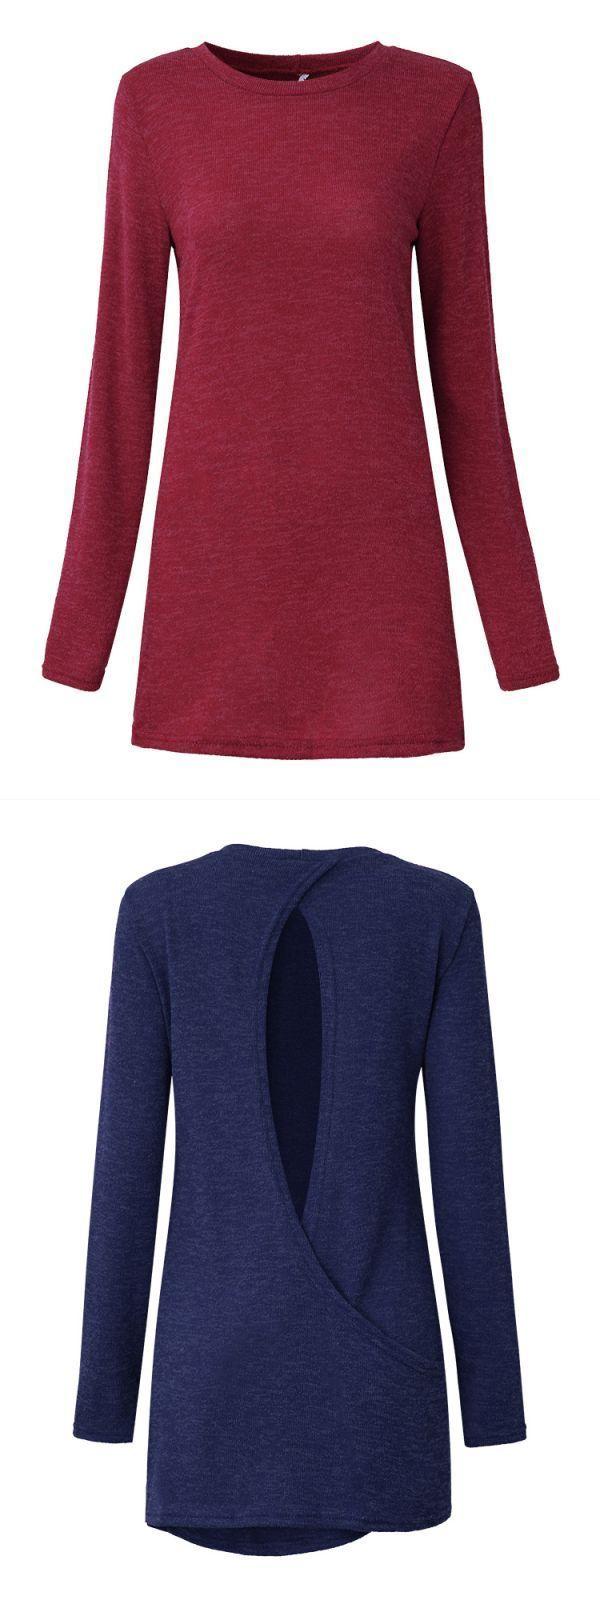 Women long sleeve sexy back hollow pure color t-shirts women#8217;s hello kitty t-shirts #hamp;m #womens #t #shirts #t #shirt #cut #girl #t-shirt #superman #girl #womens #zombie #t-shirts